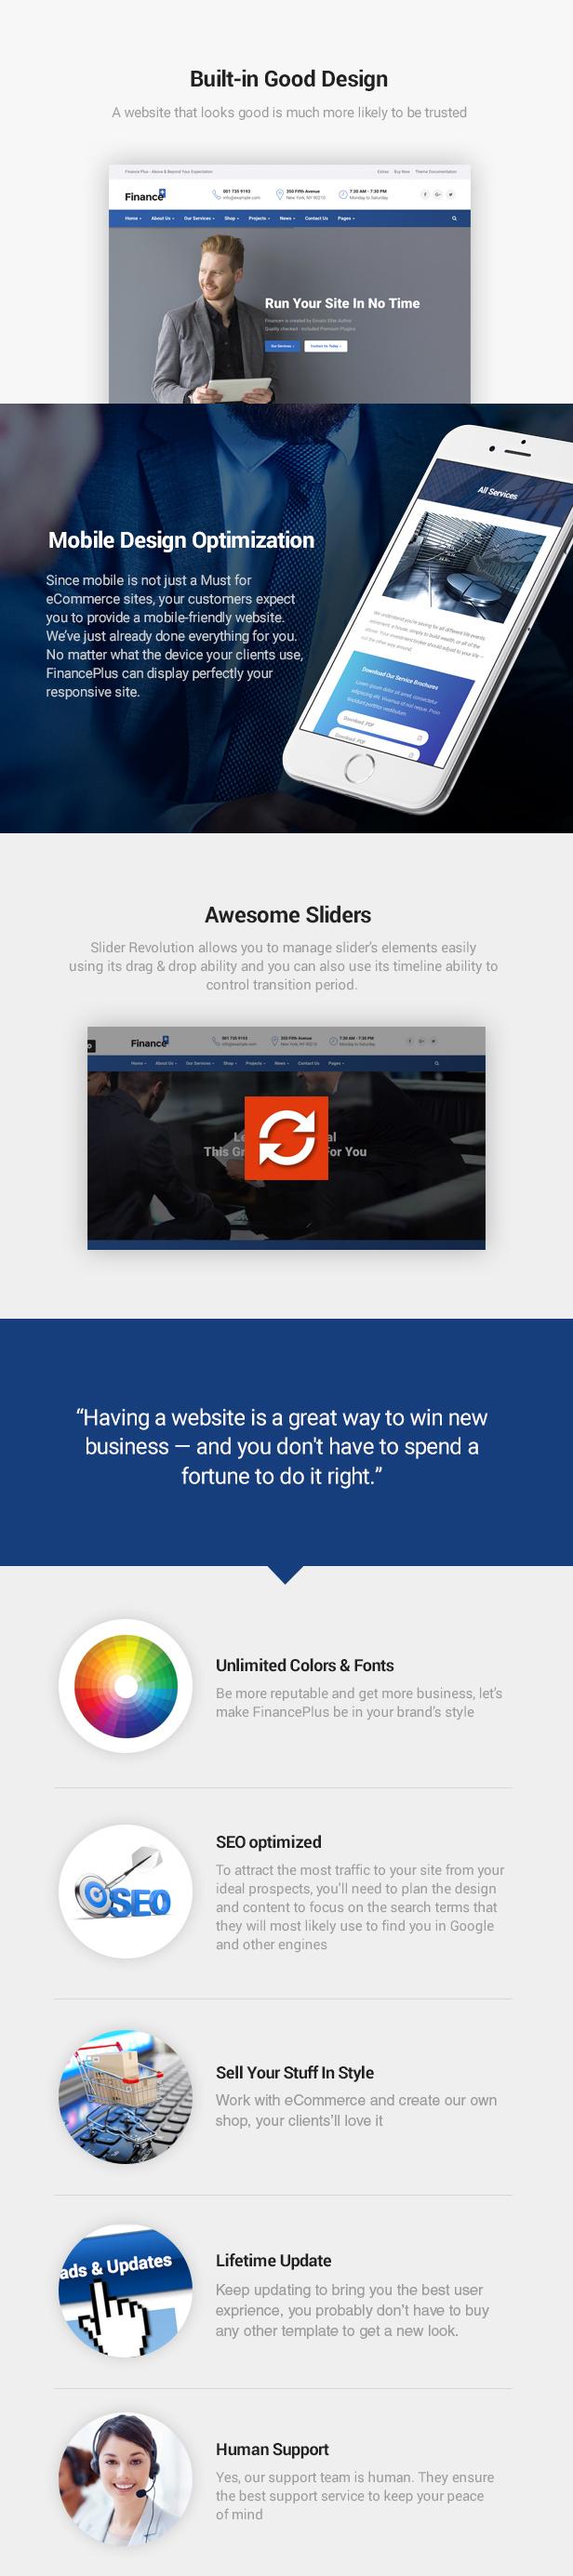 Sanders - Plantilla de Bootstrap 4 de Finance and Business de confianza - 5